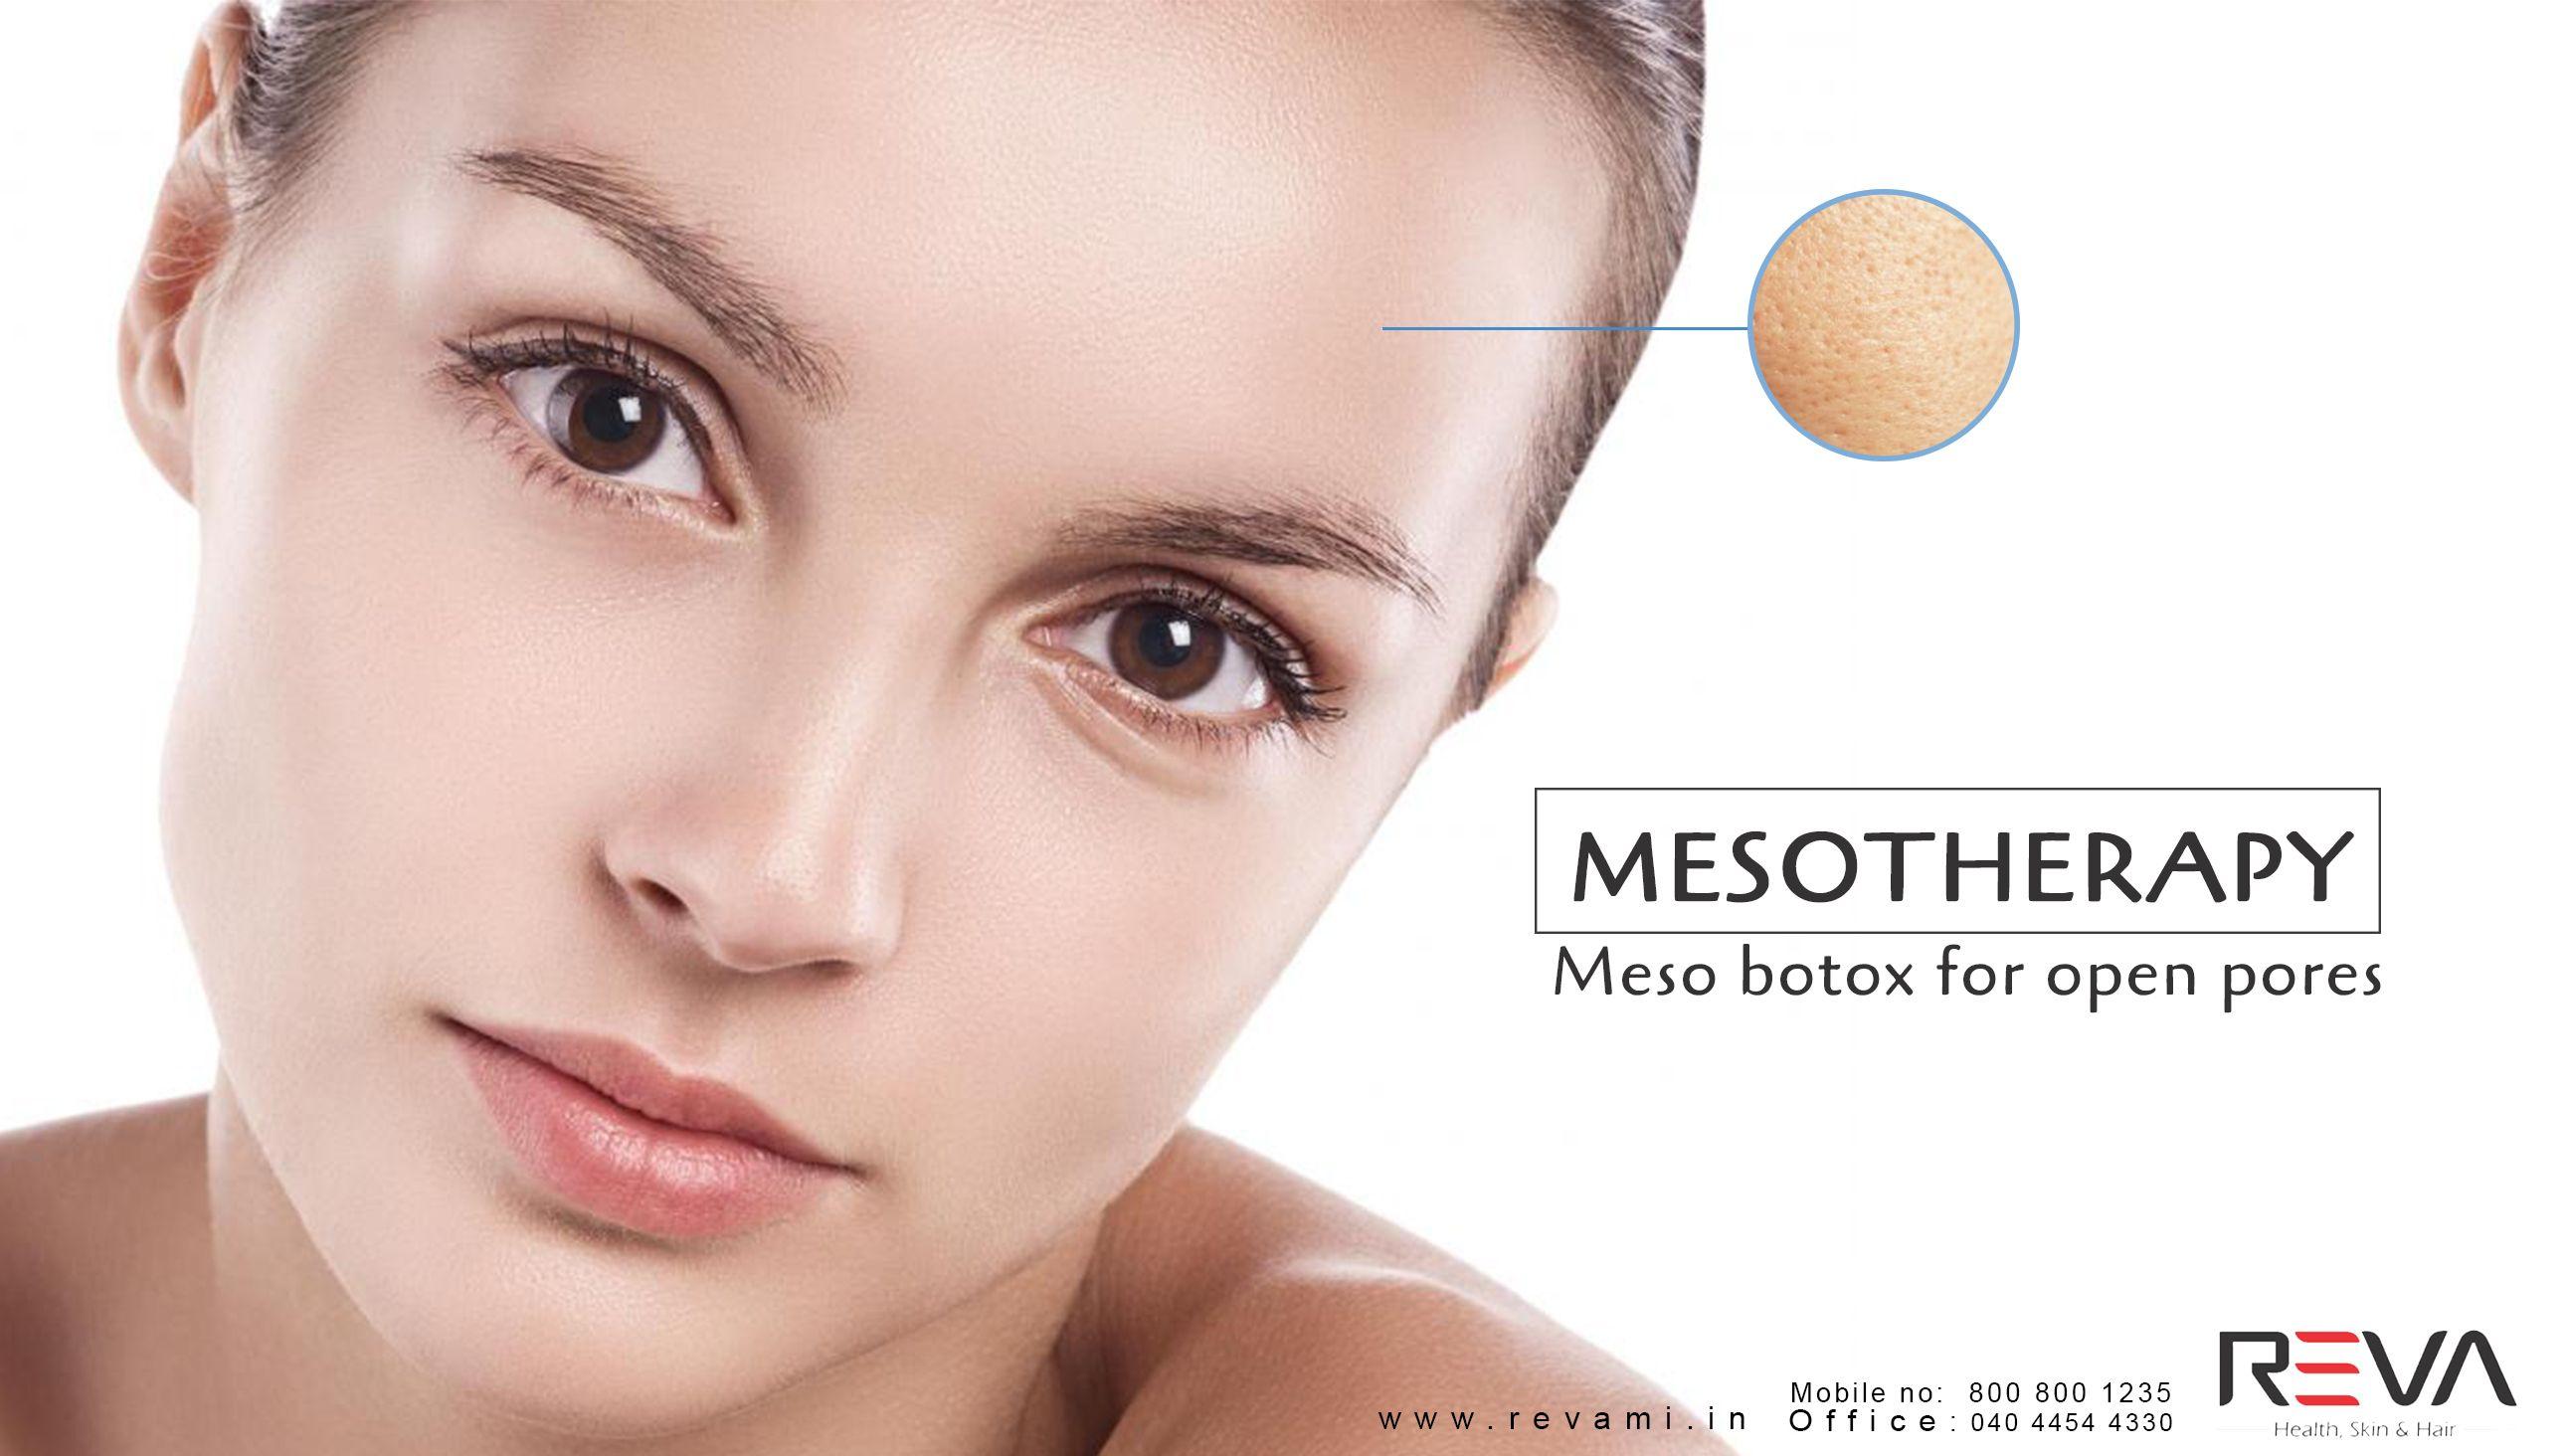 Mesotherapy Meso botox for open pores more info> http